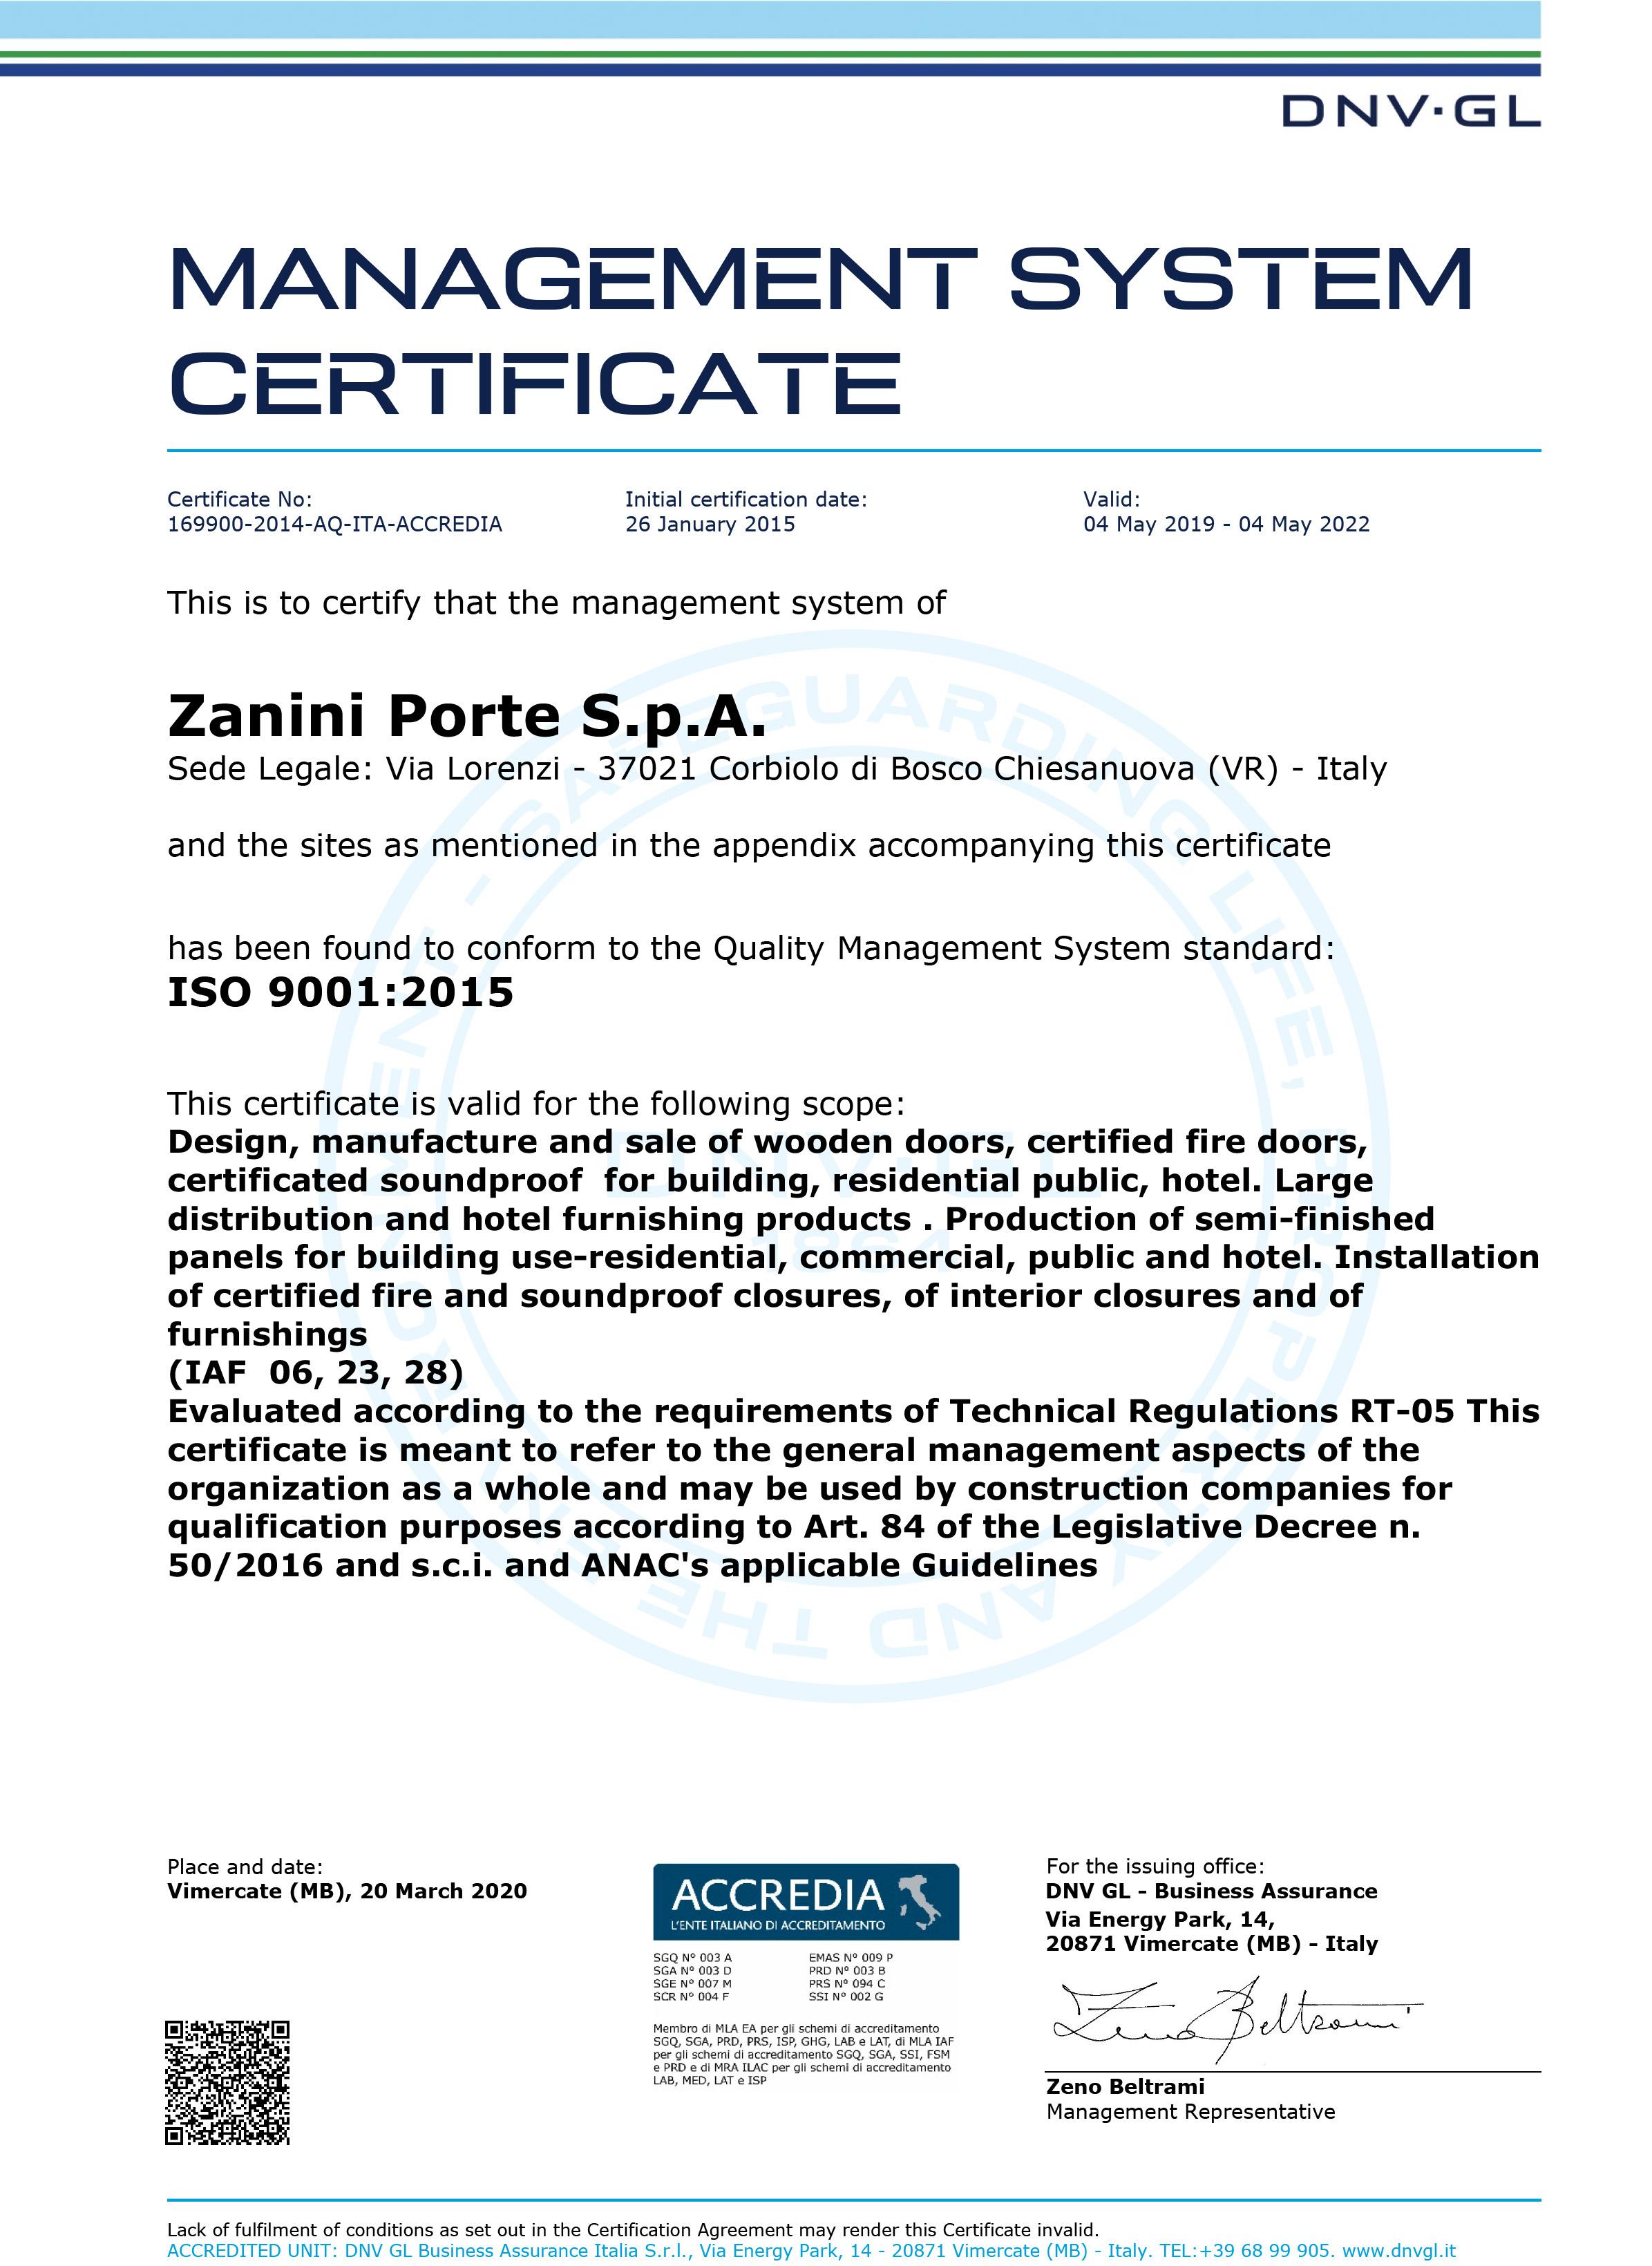 ZANINI-PORTE-S.p.A. ISO-9001 ENG